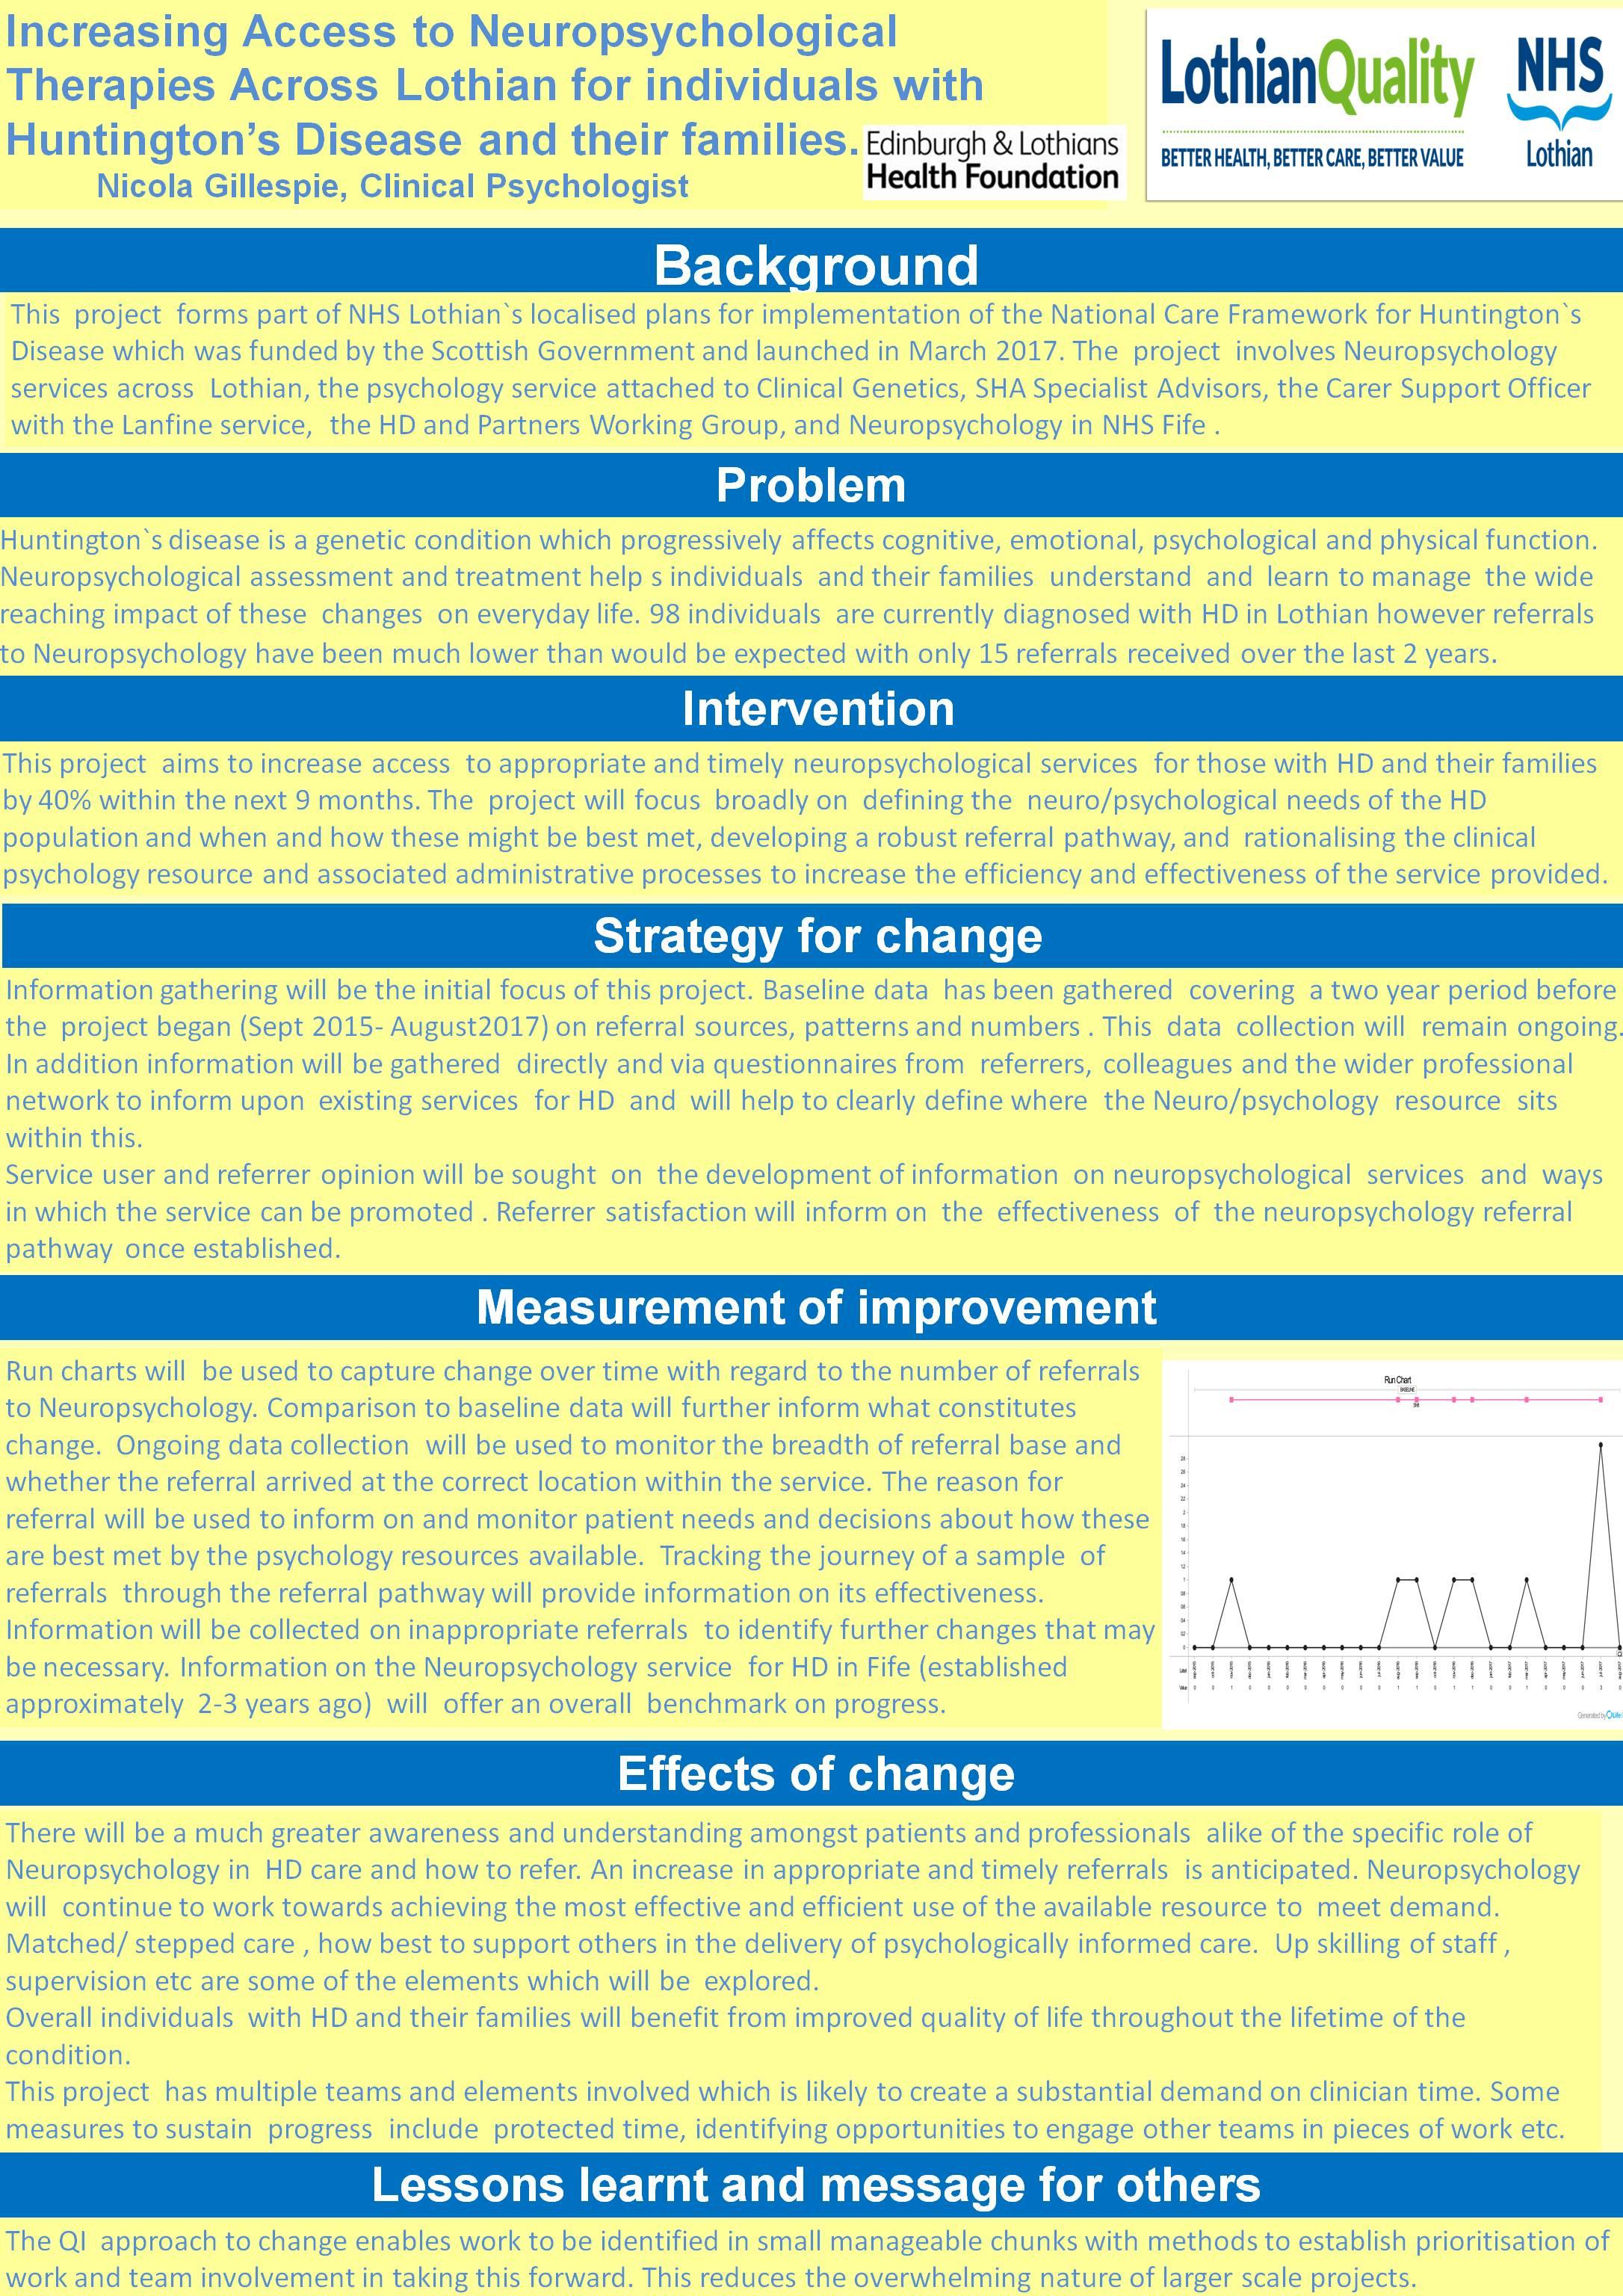 10-Nicola-Poster-presentation-final-QI-HD-Project-Nov-2017.jpg